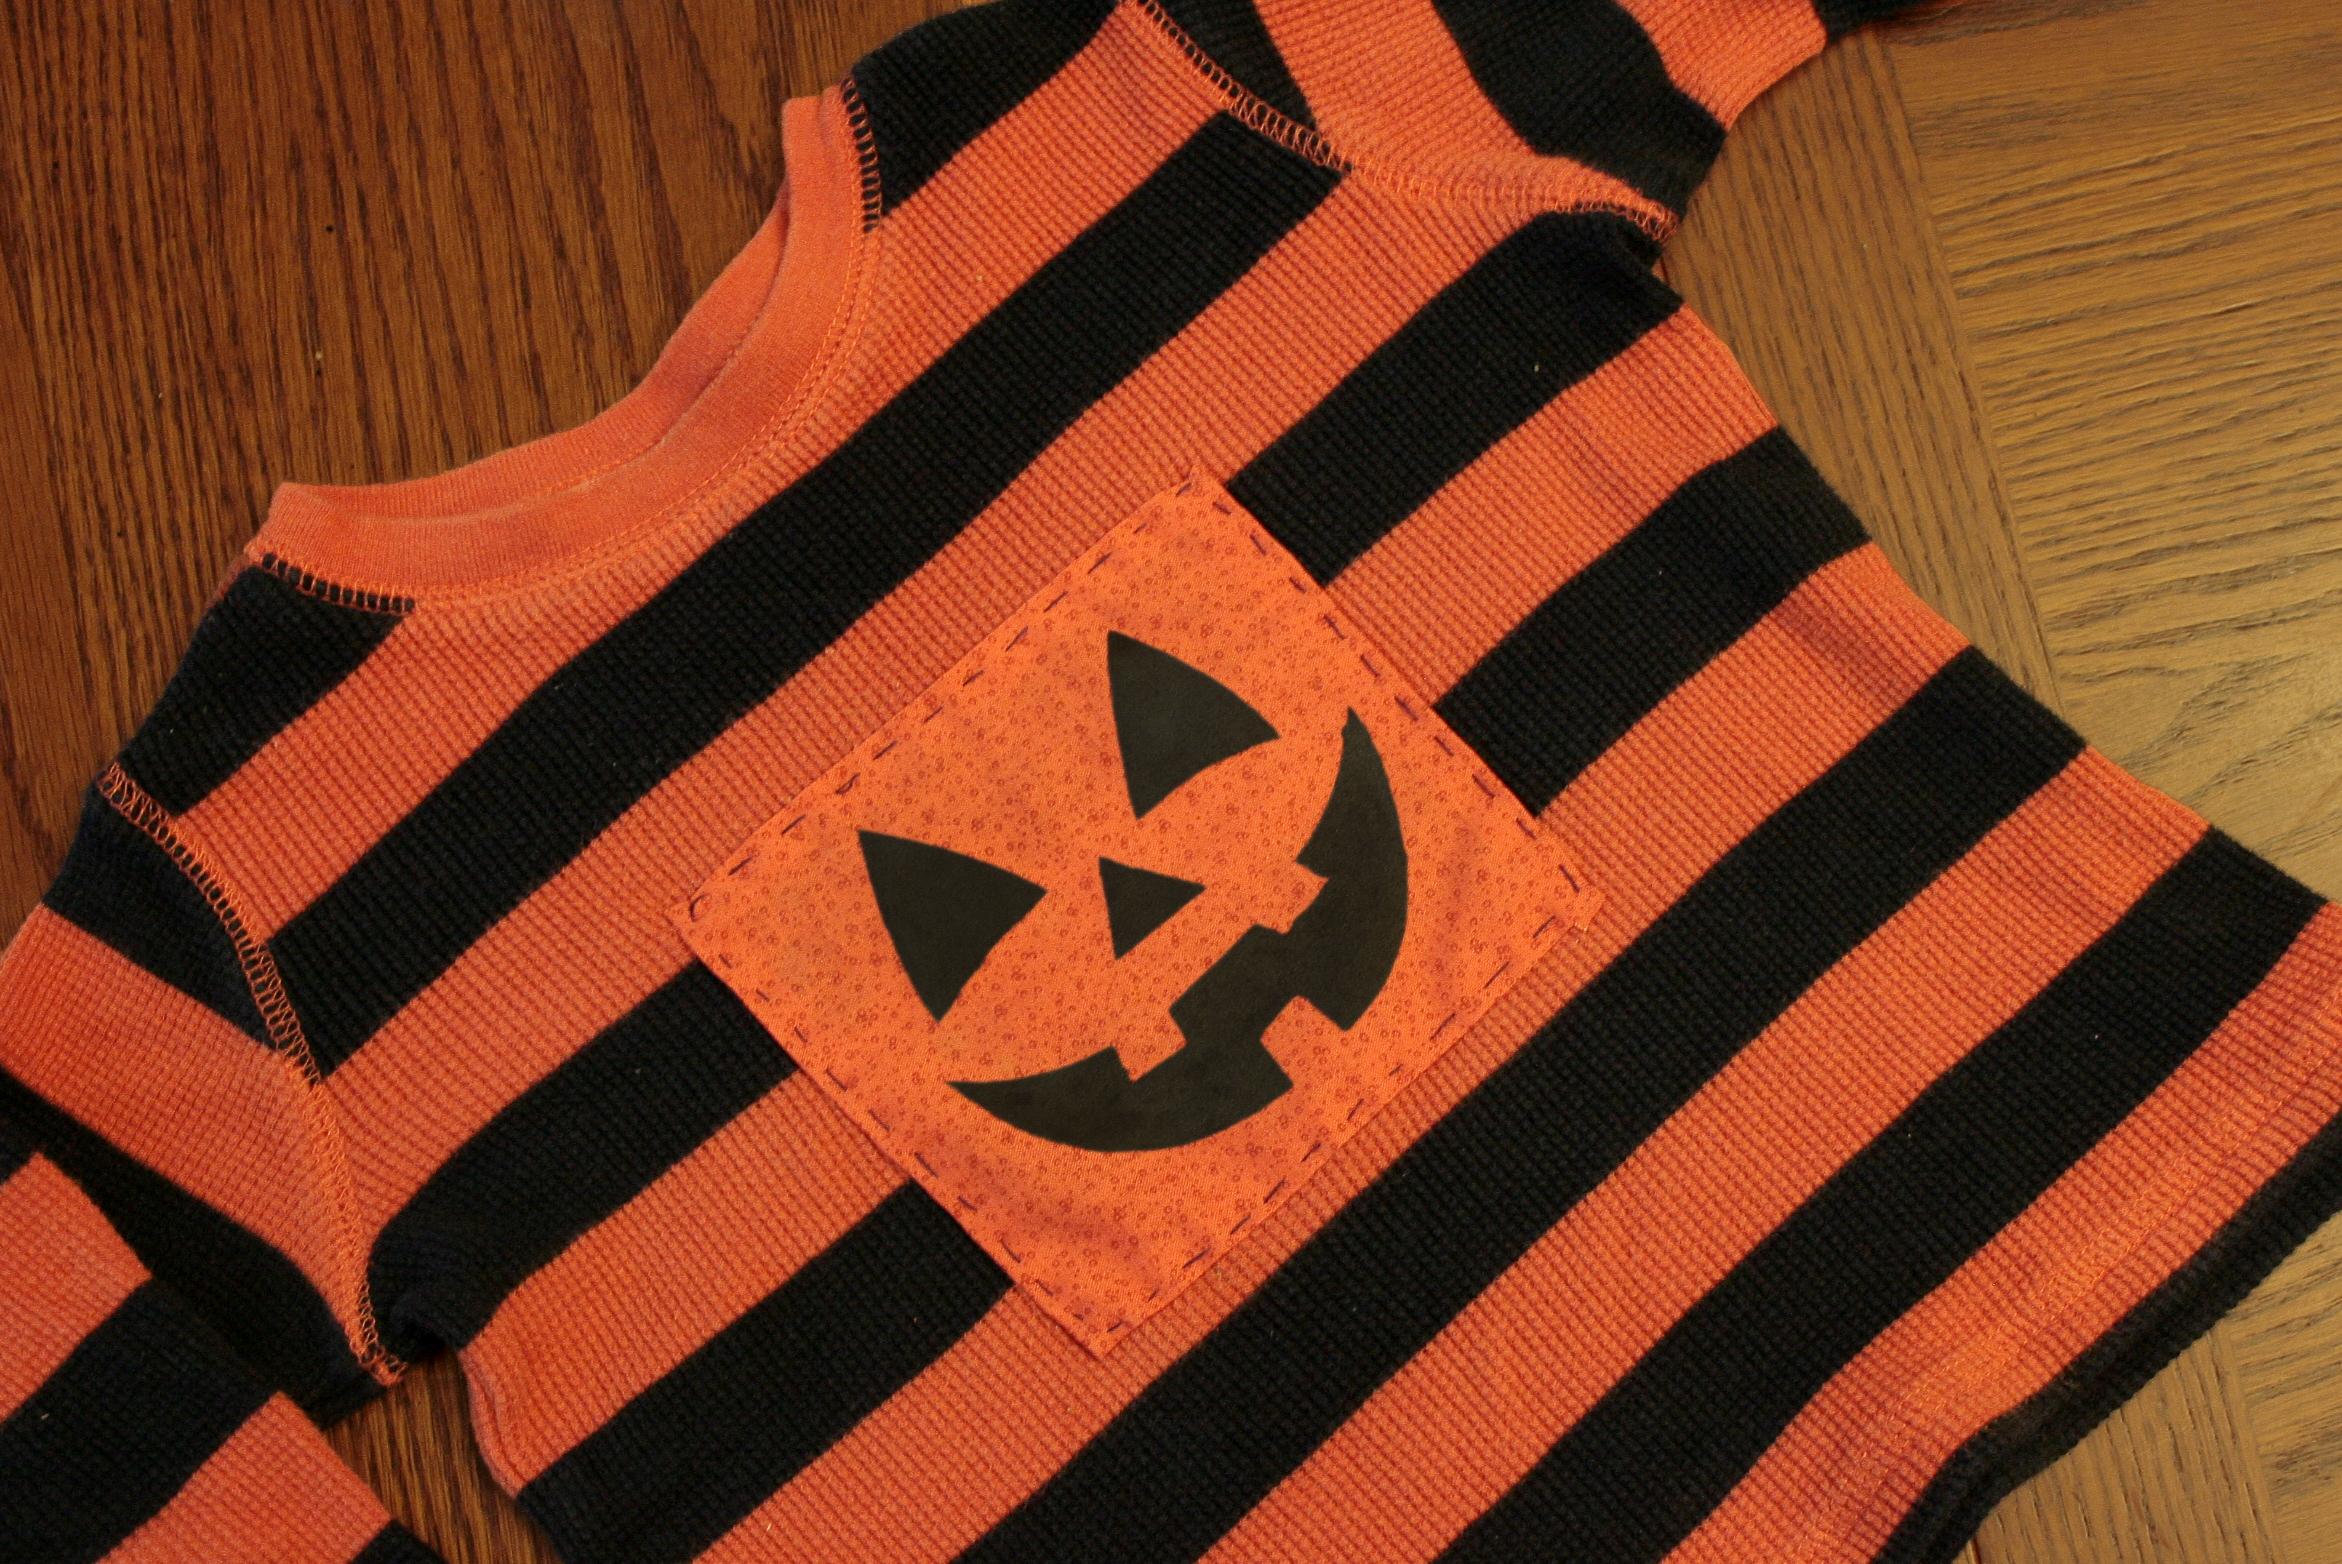 Shirt jack design template - Jack O Lantern Shirt Stencils